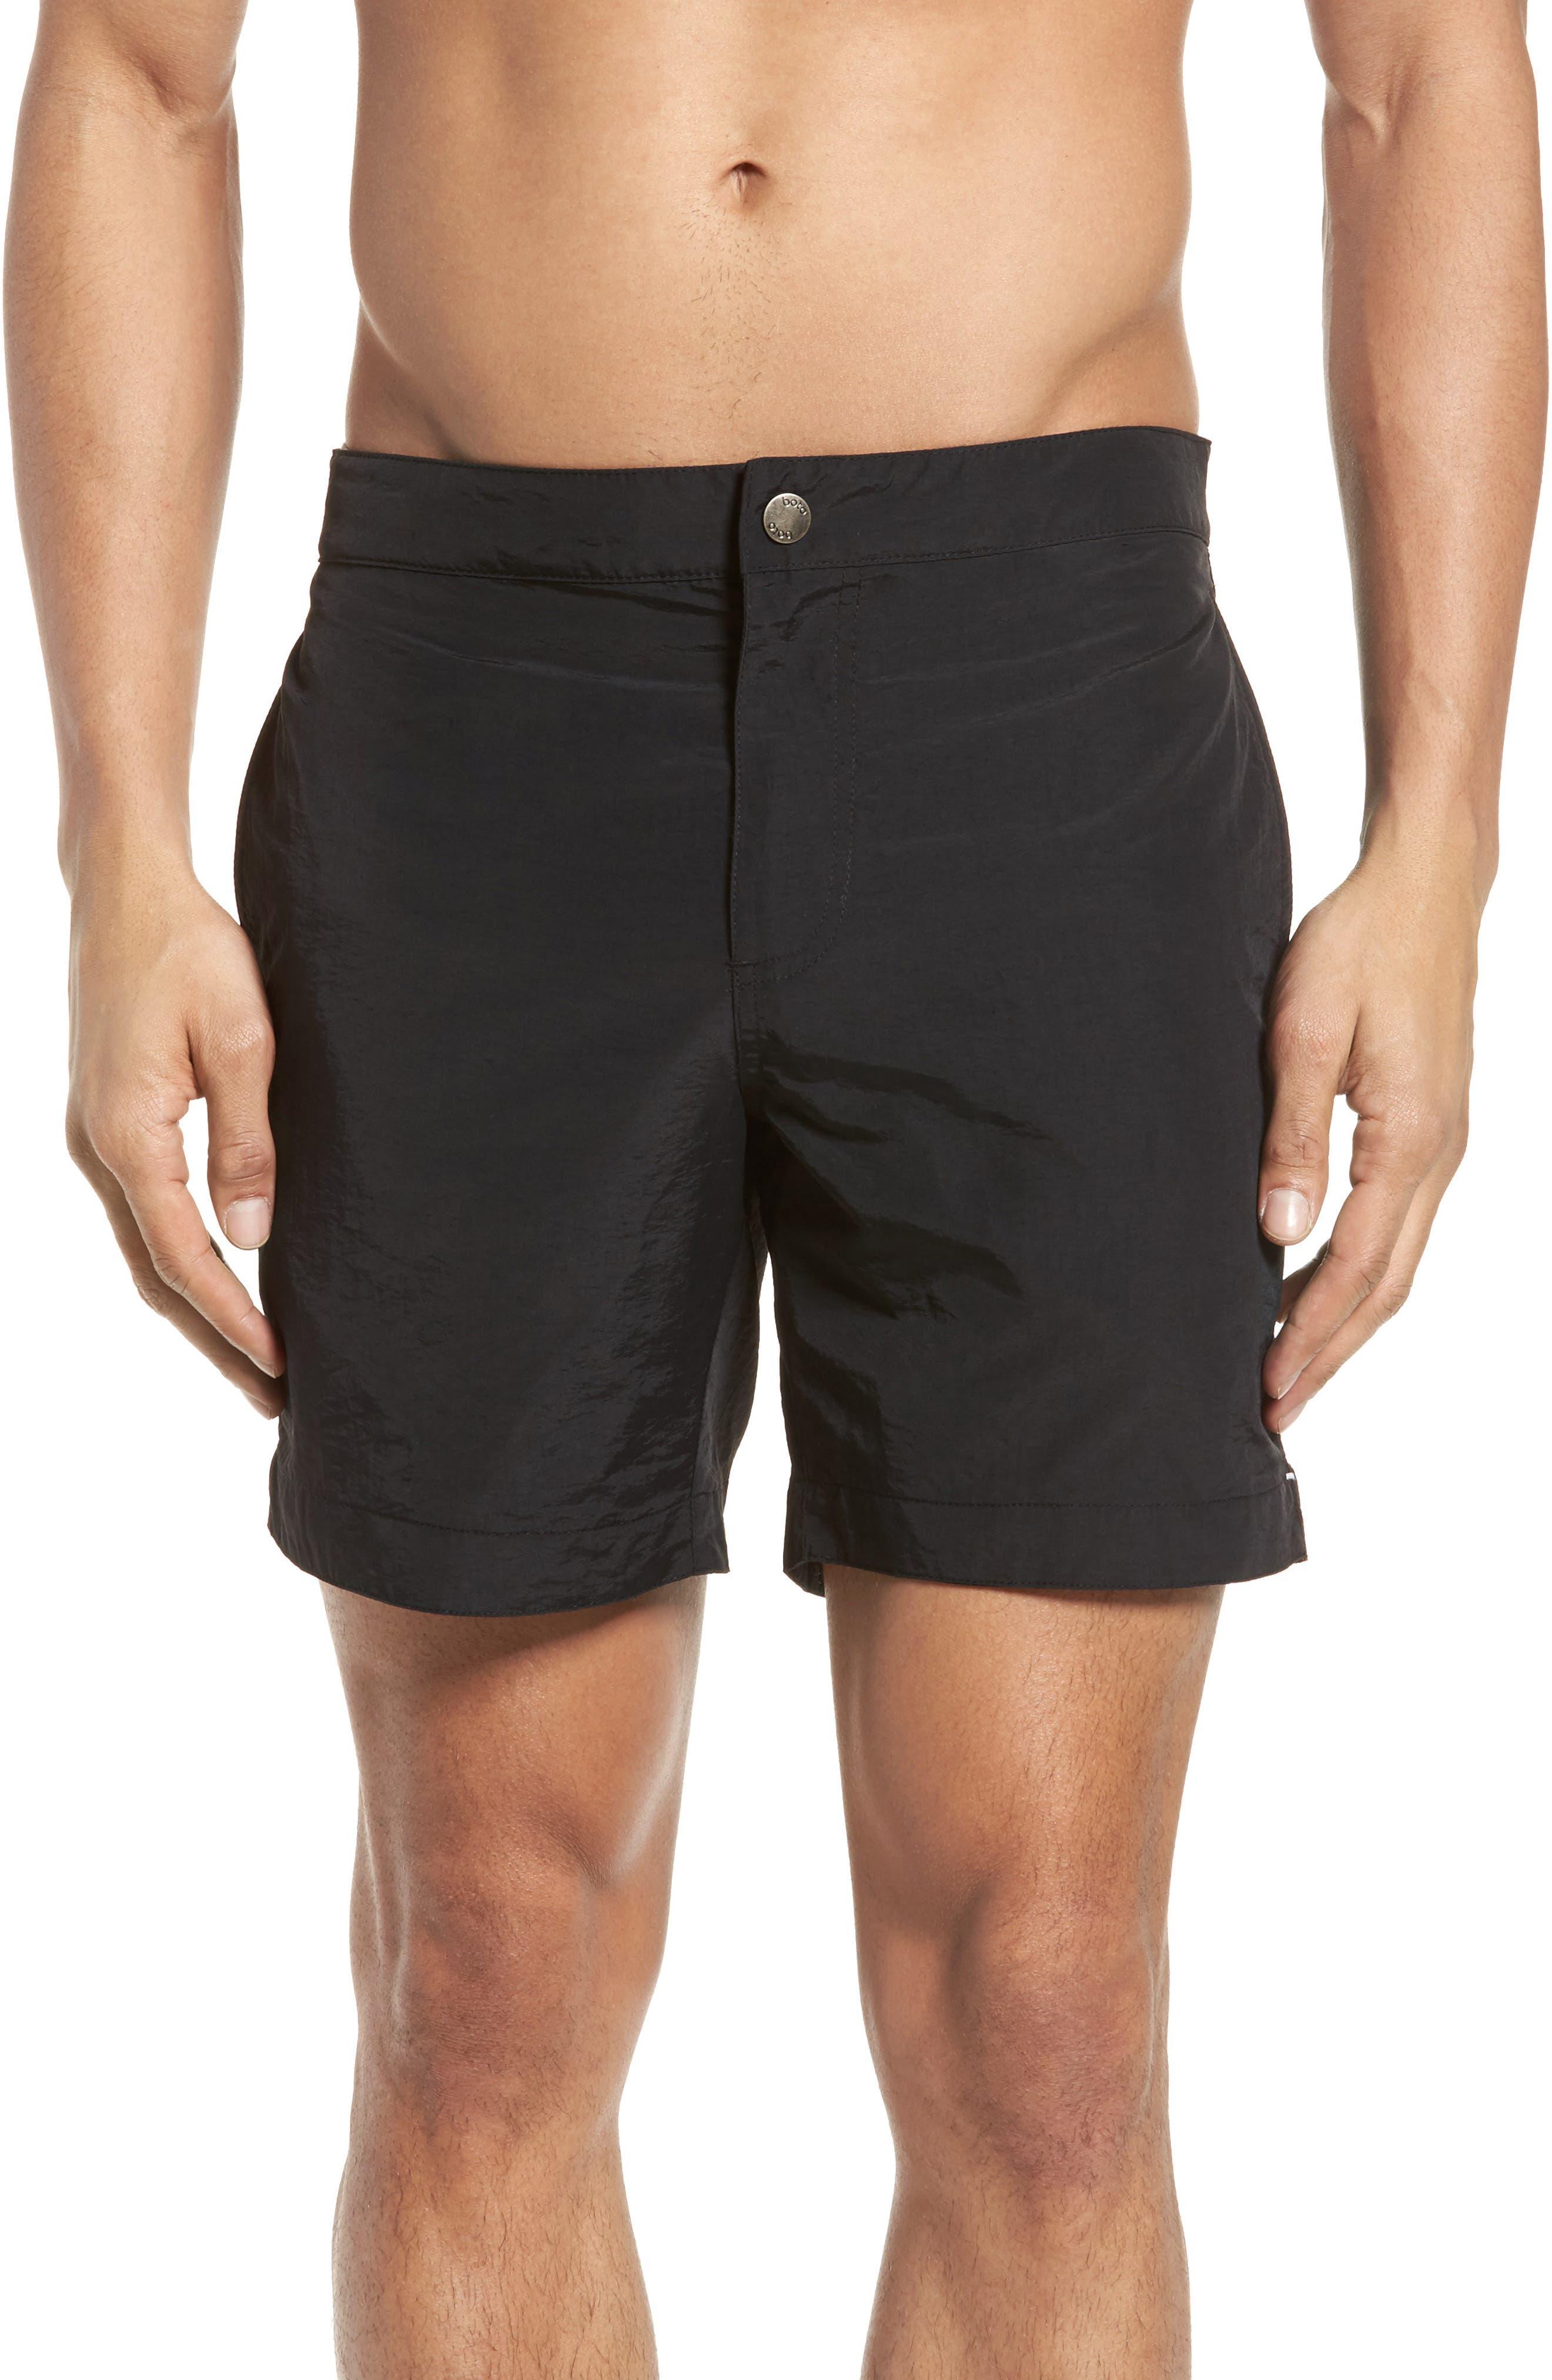 'Aruba' Tailored Fit Swim Trunks,                         Main,                         color, Midnight Black Solid